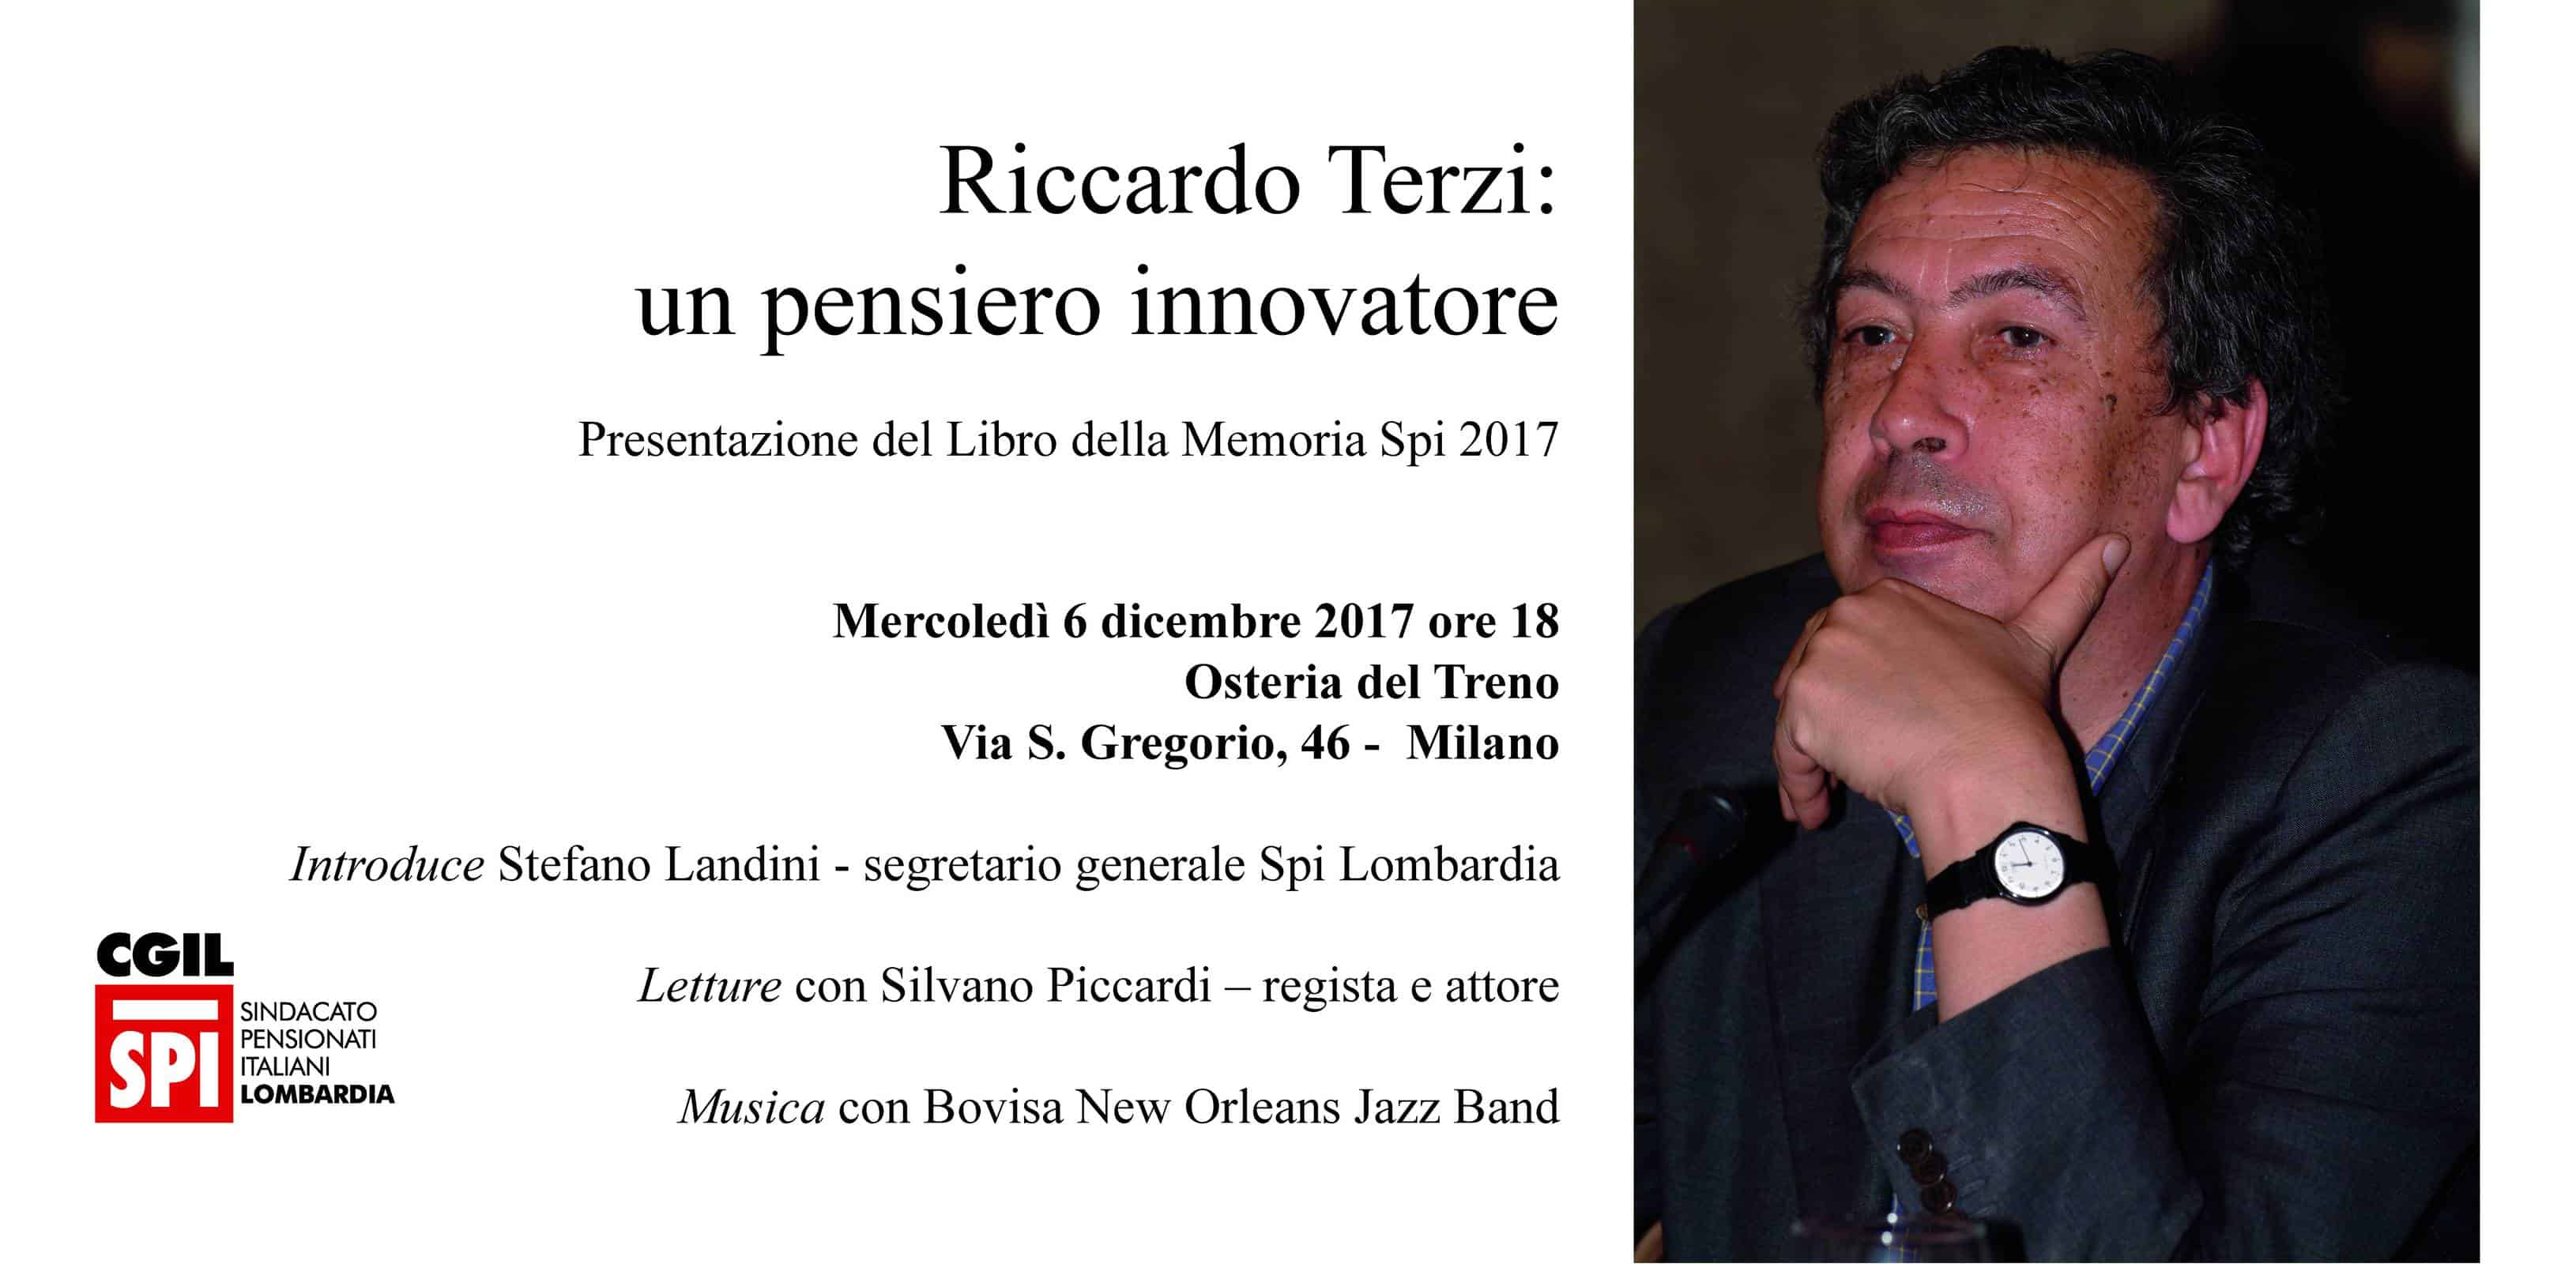 Riccardo Terzi, un pensiero innovatore